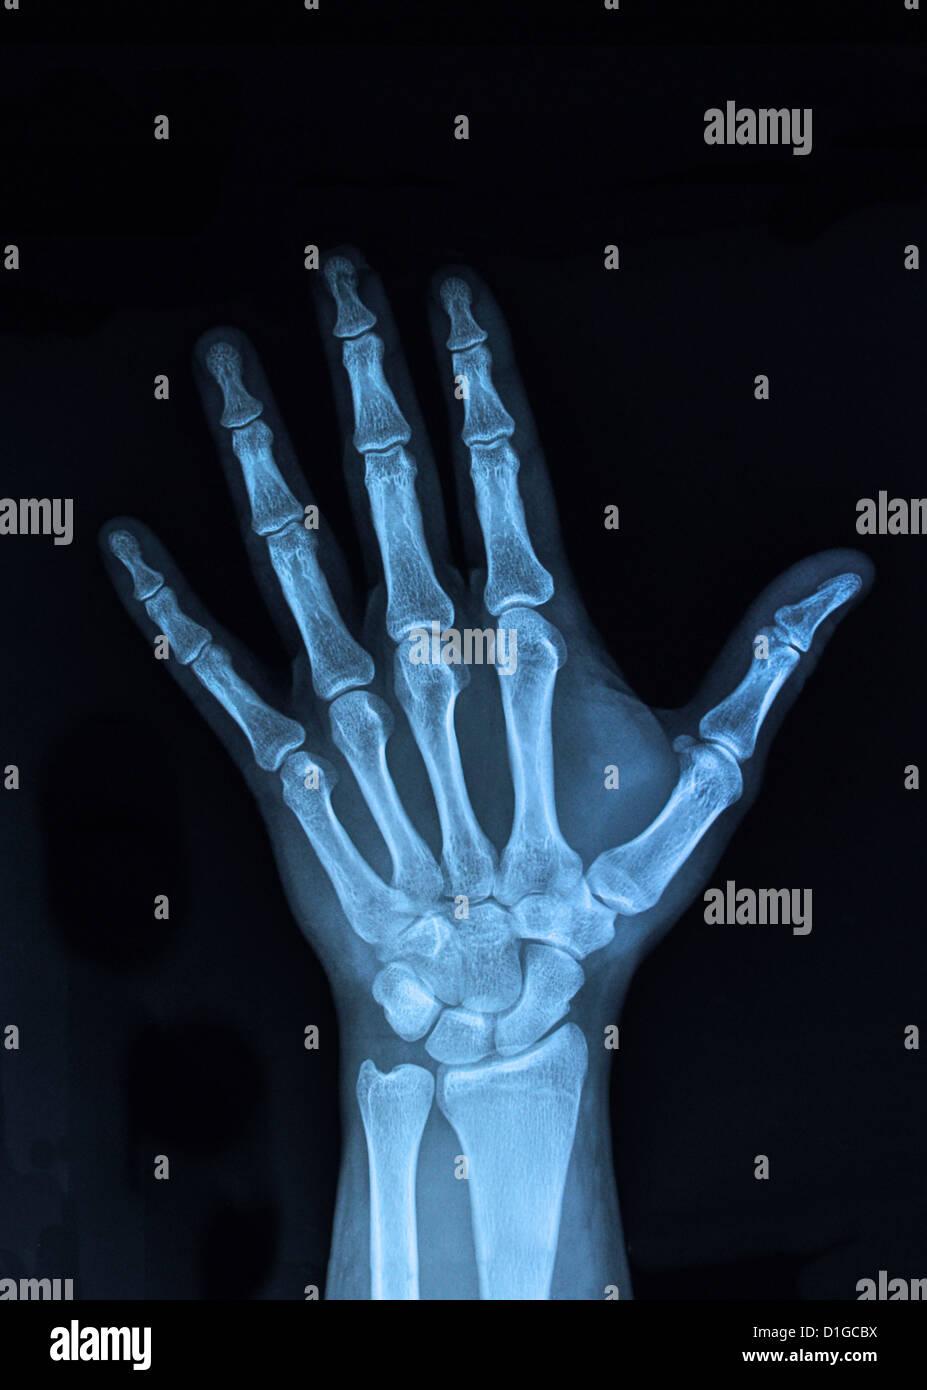 xray hand - Stock Image